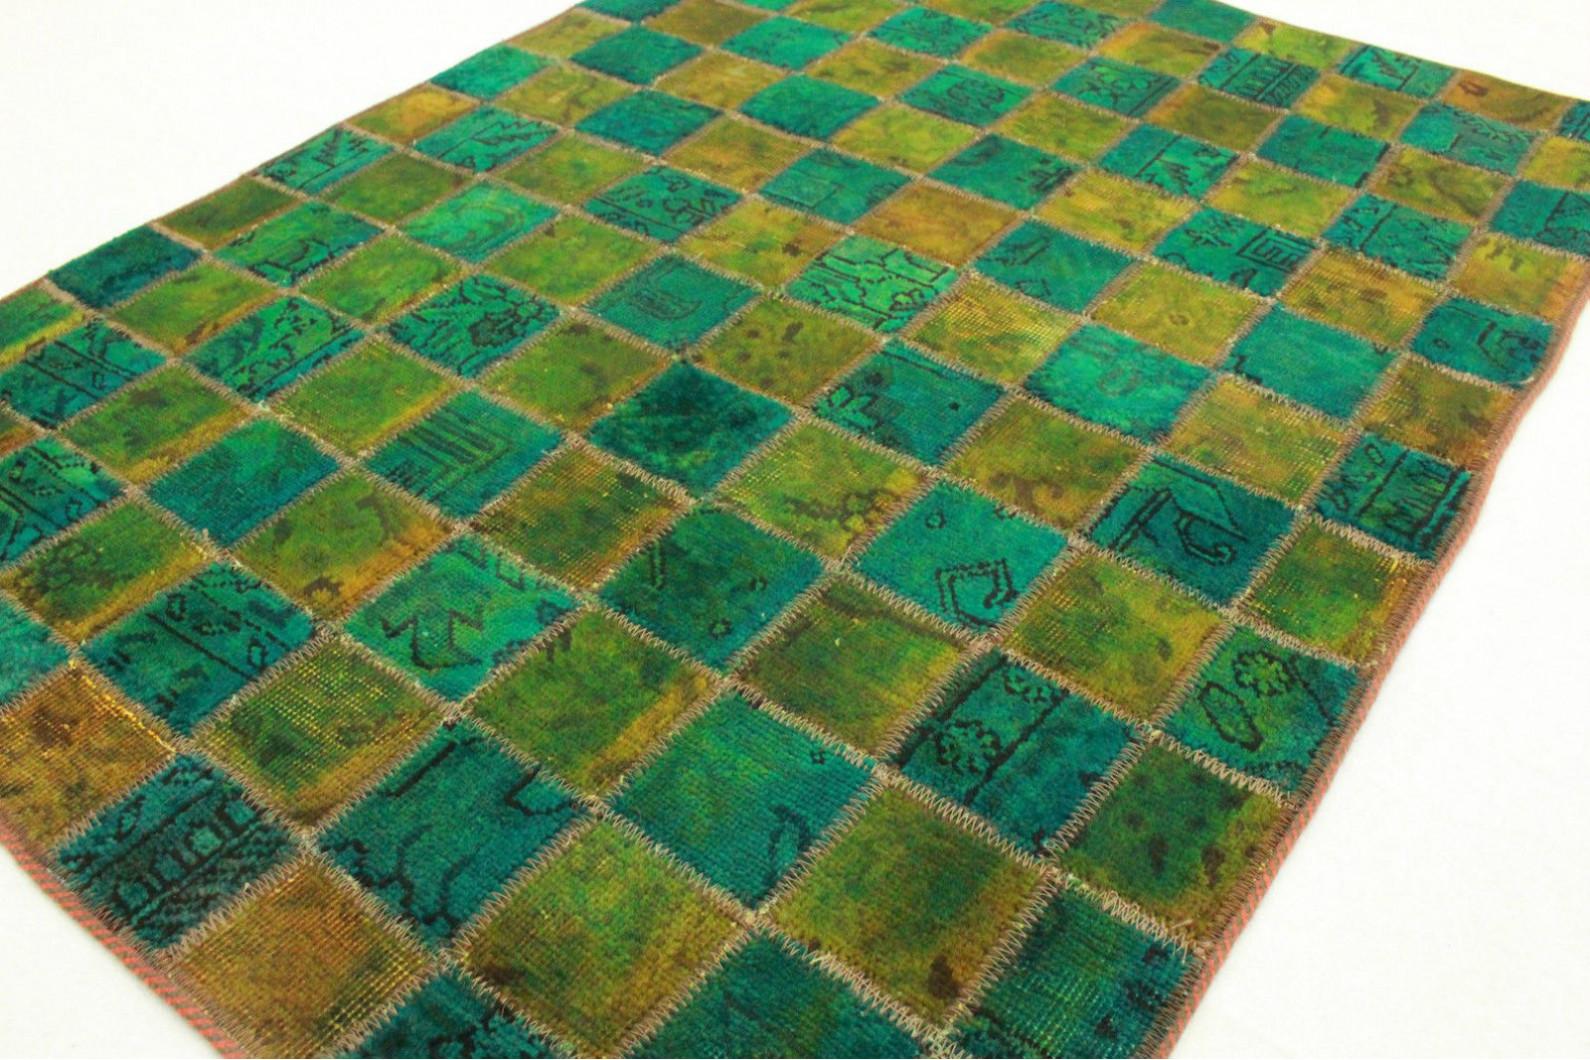 patchwork teppich gr n t rkis in 140x100cm 1001 2322 bei kaufen. Black Bedroom Furniture Sets. Home Design Ideas